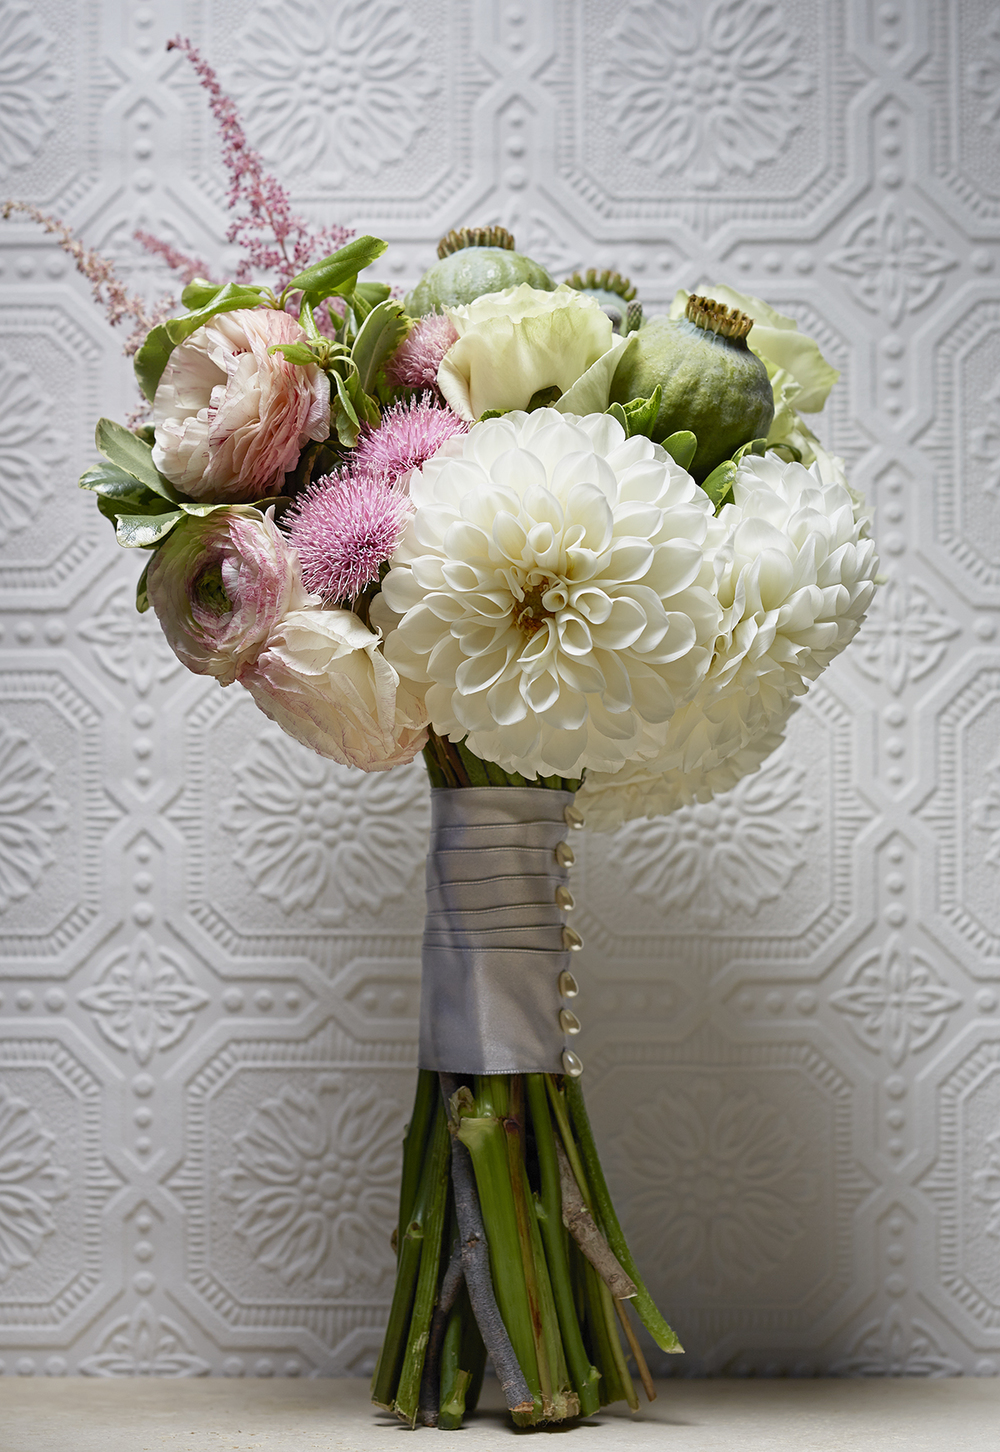 Regal White | Architectural bouquet featuring dahlias & poppy pods